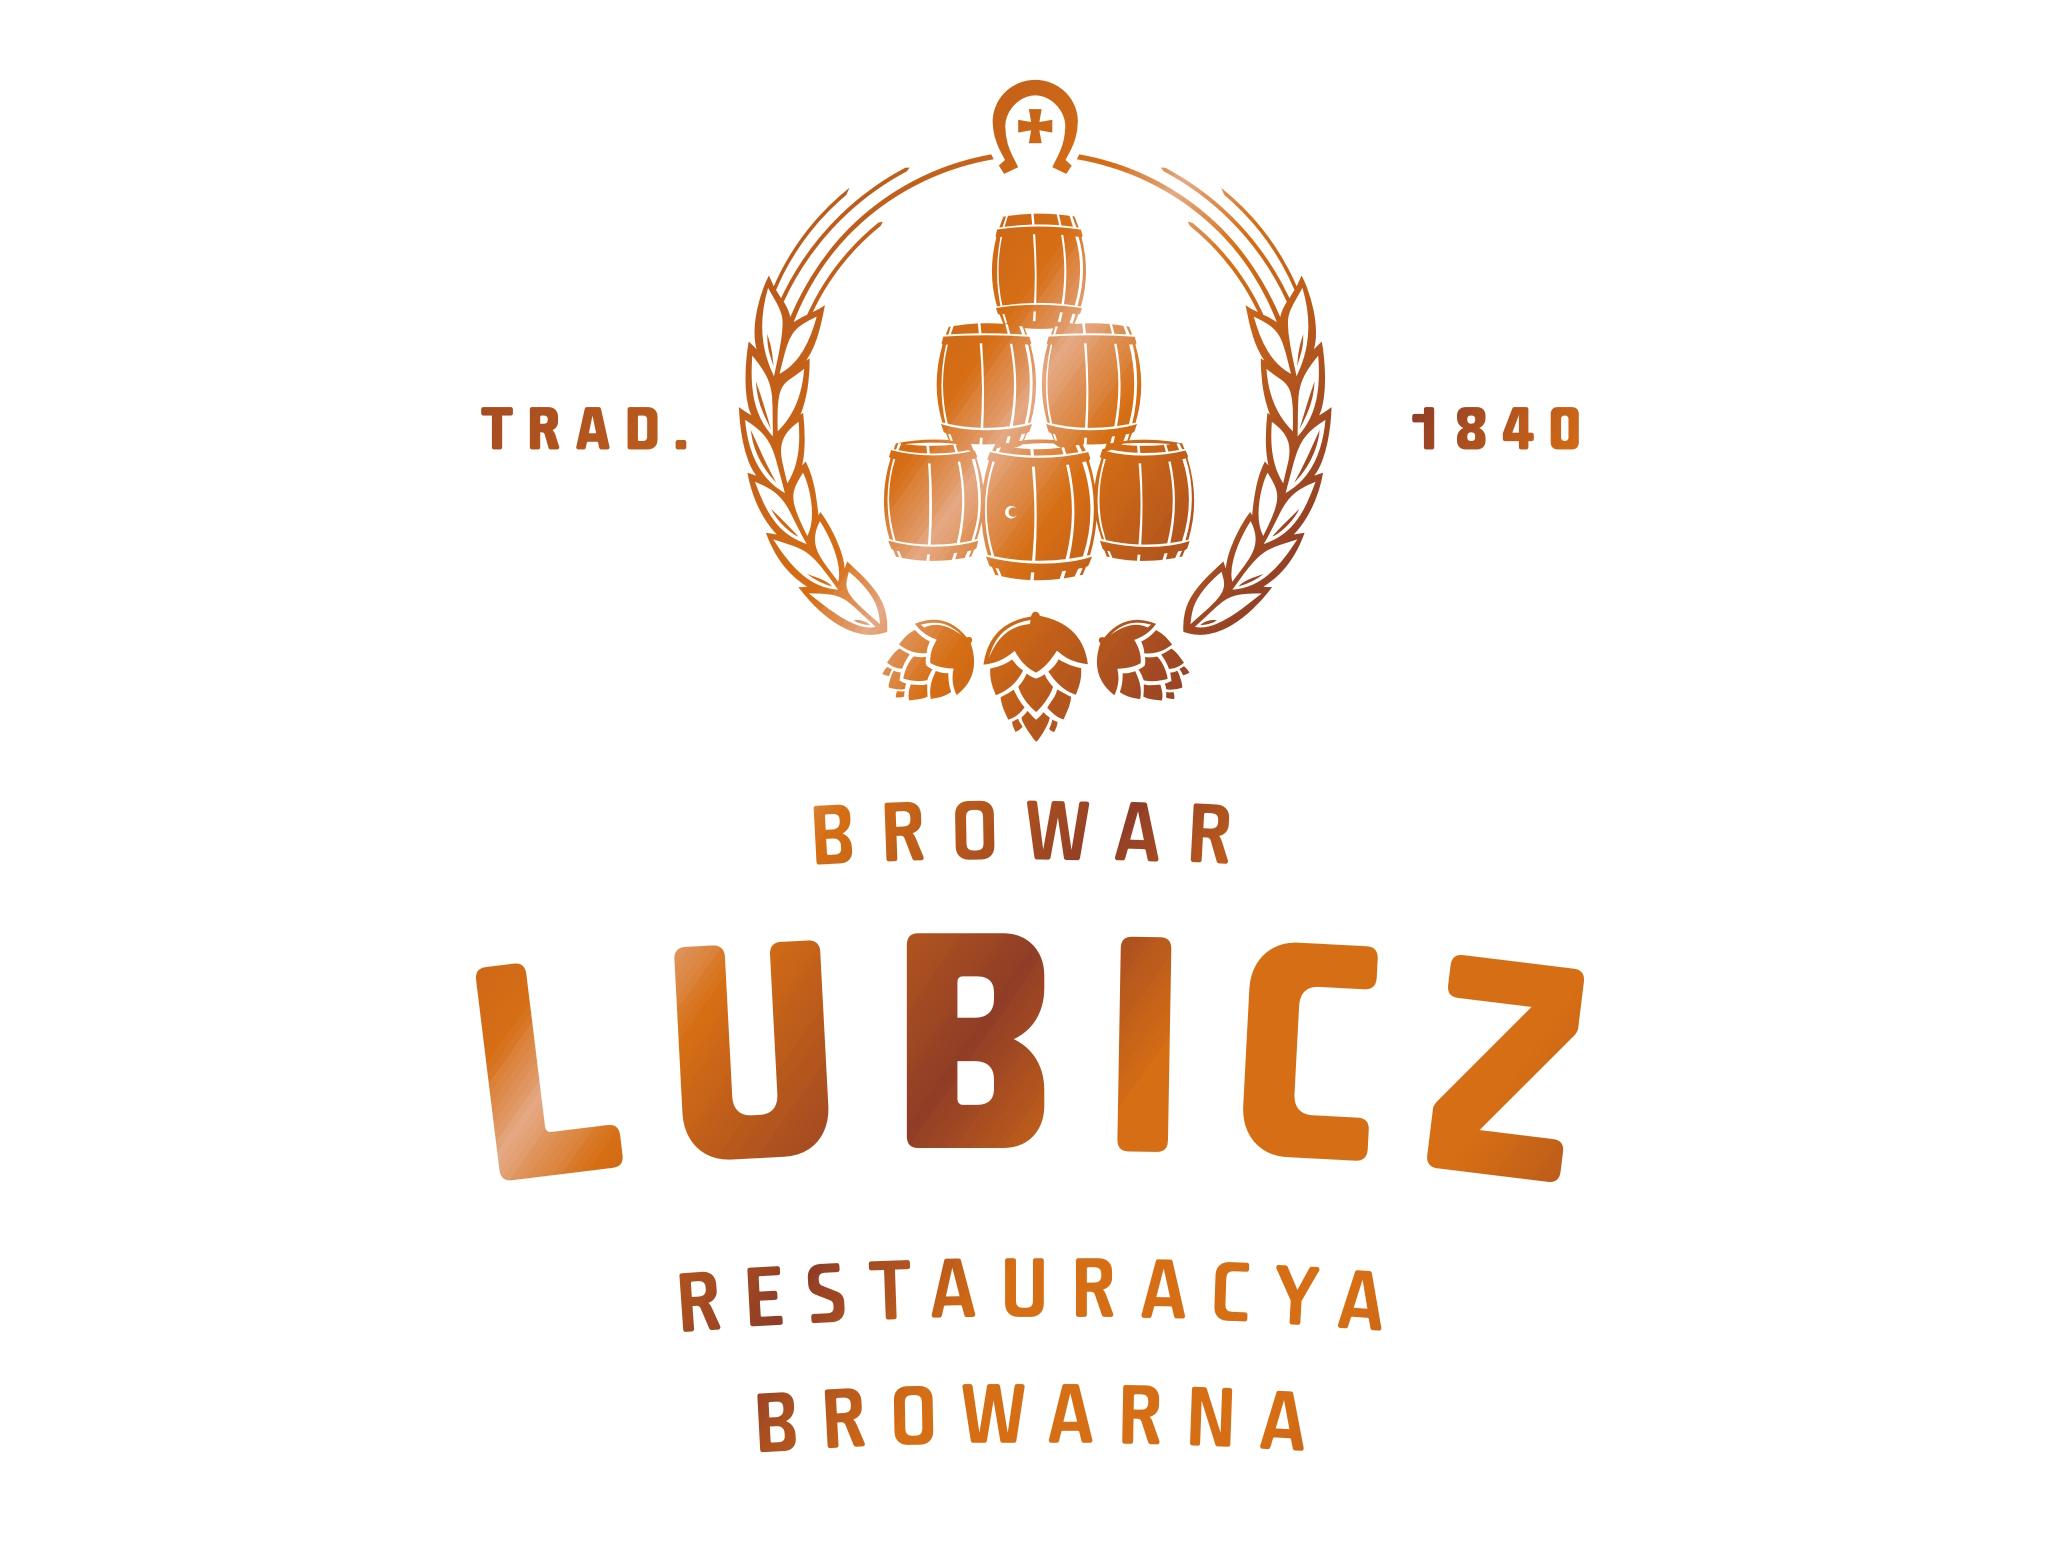 Browar Lubicz logo